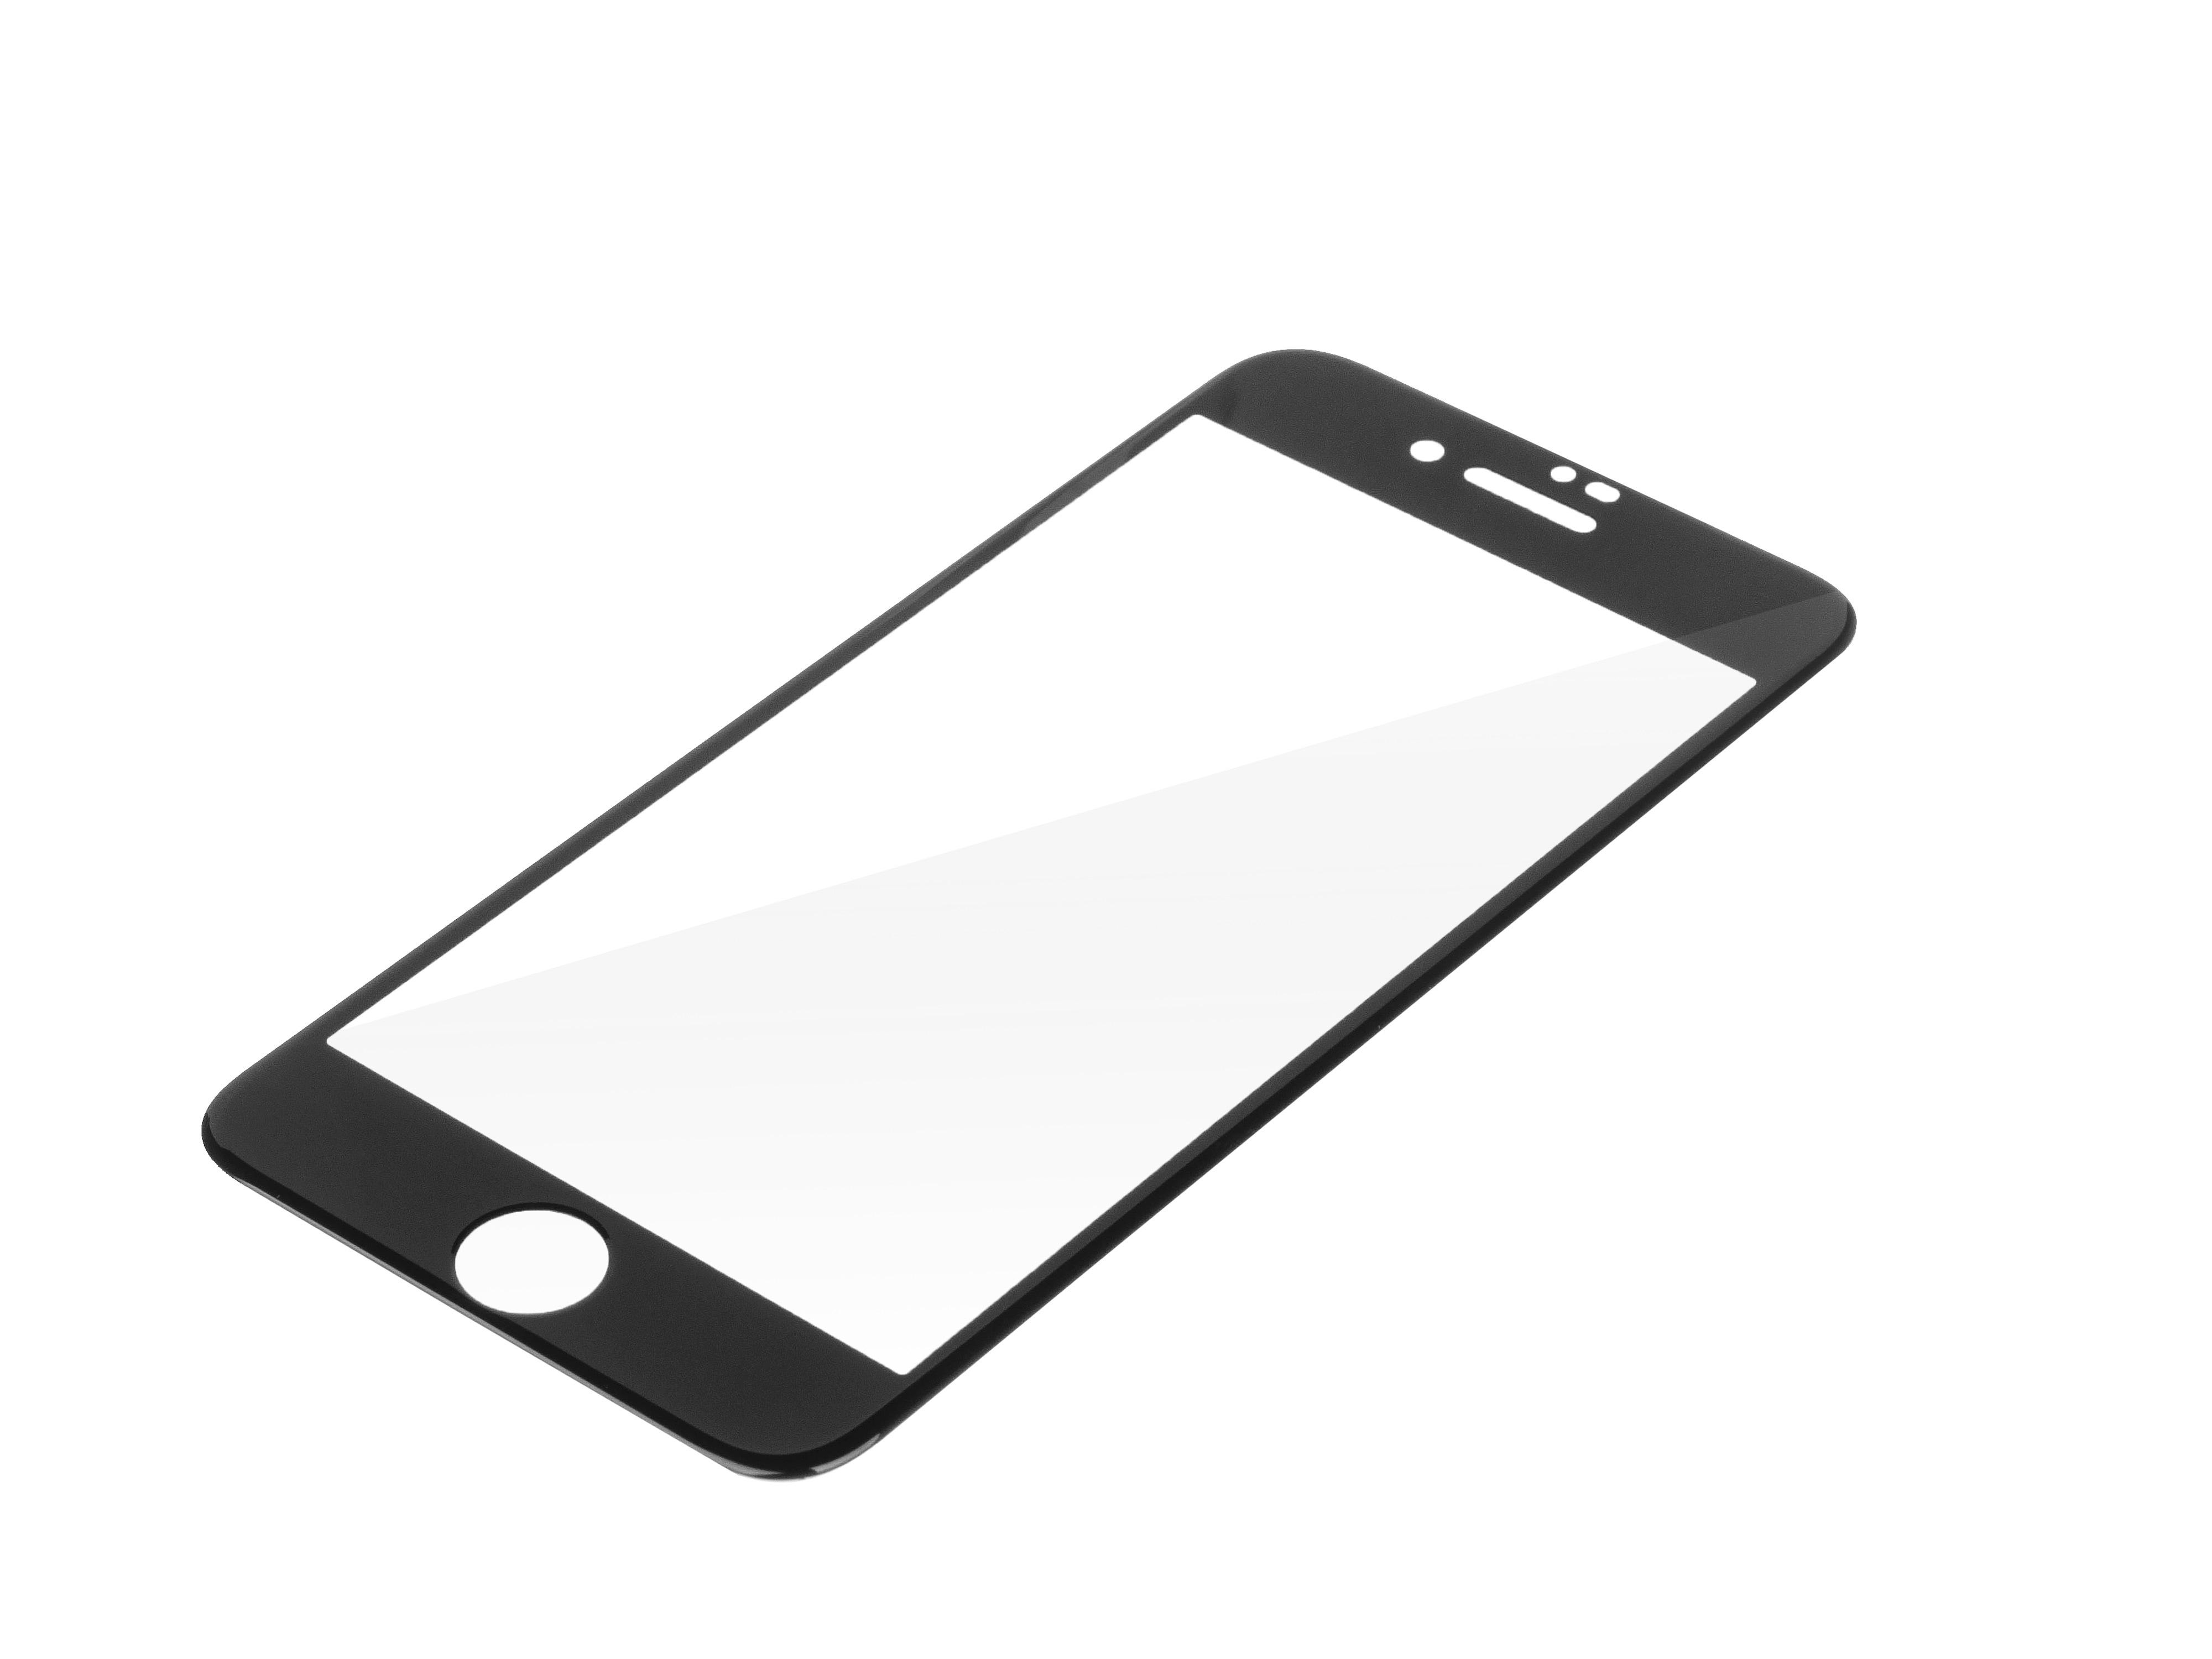 GC® GC Clarity Screen Protector Apple iPhone 7 8 - Black - 2